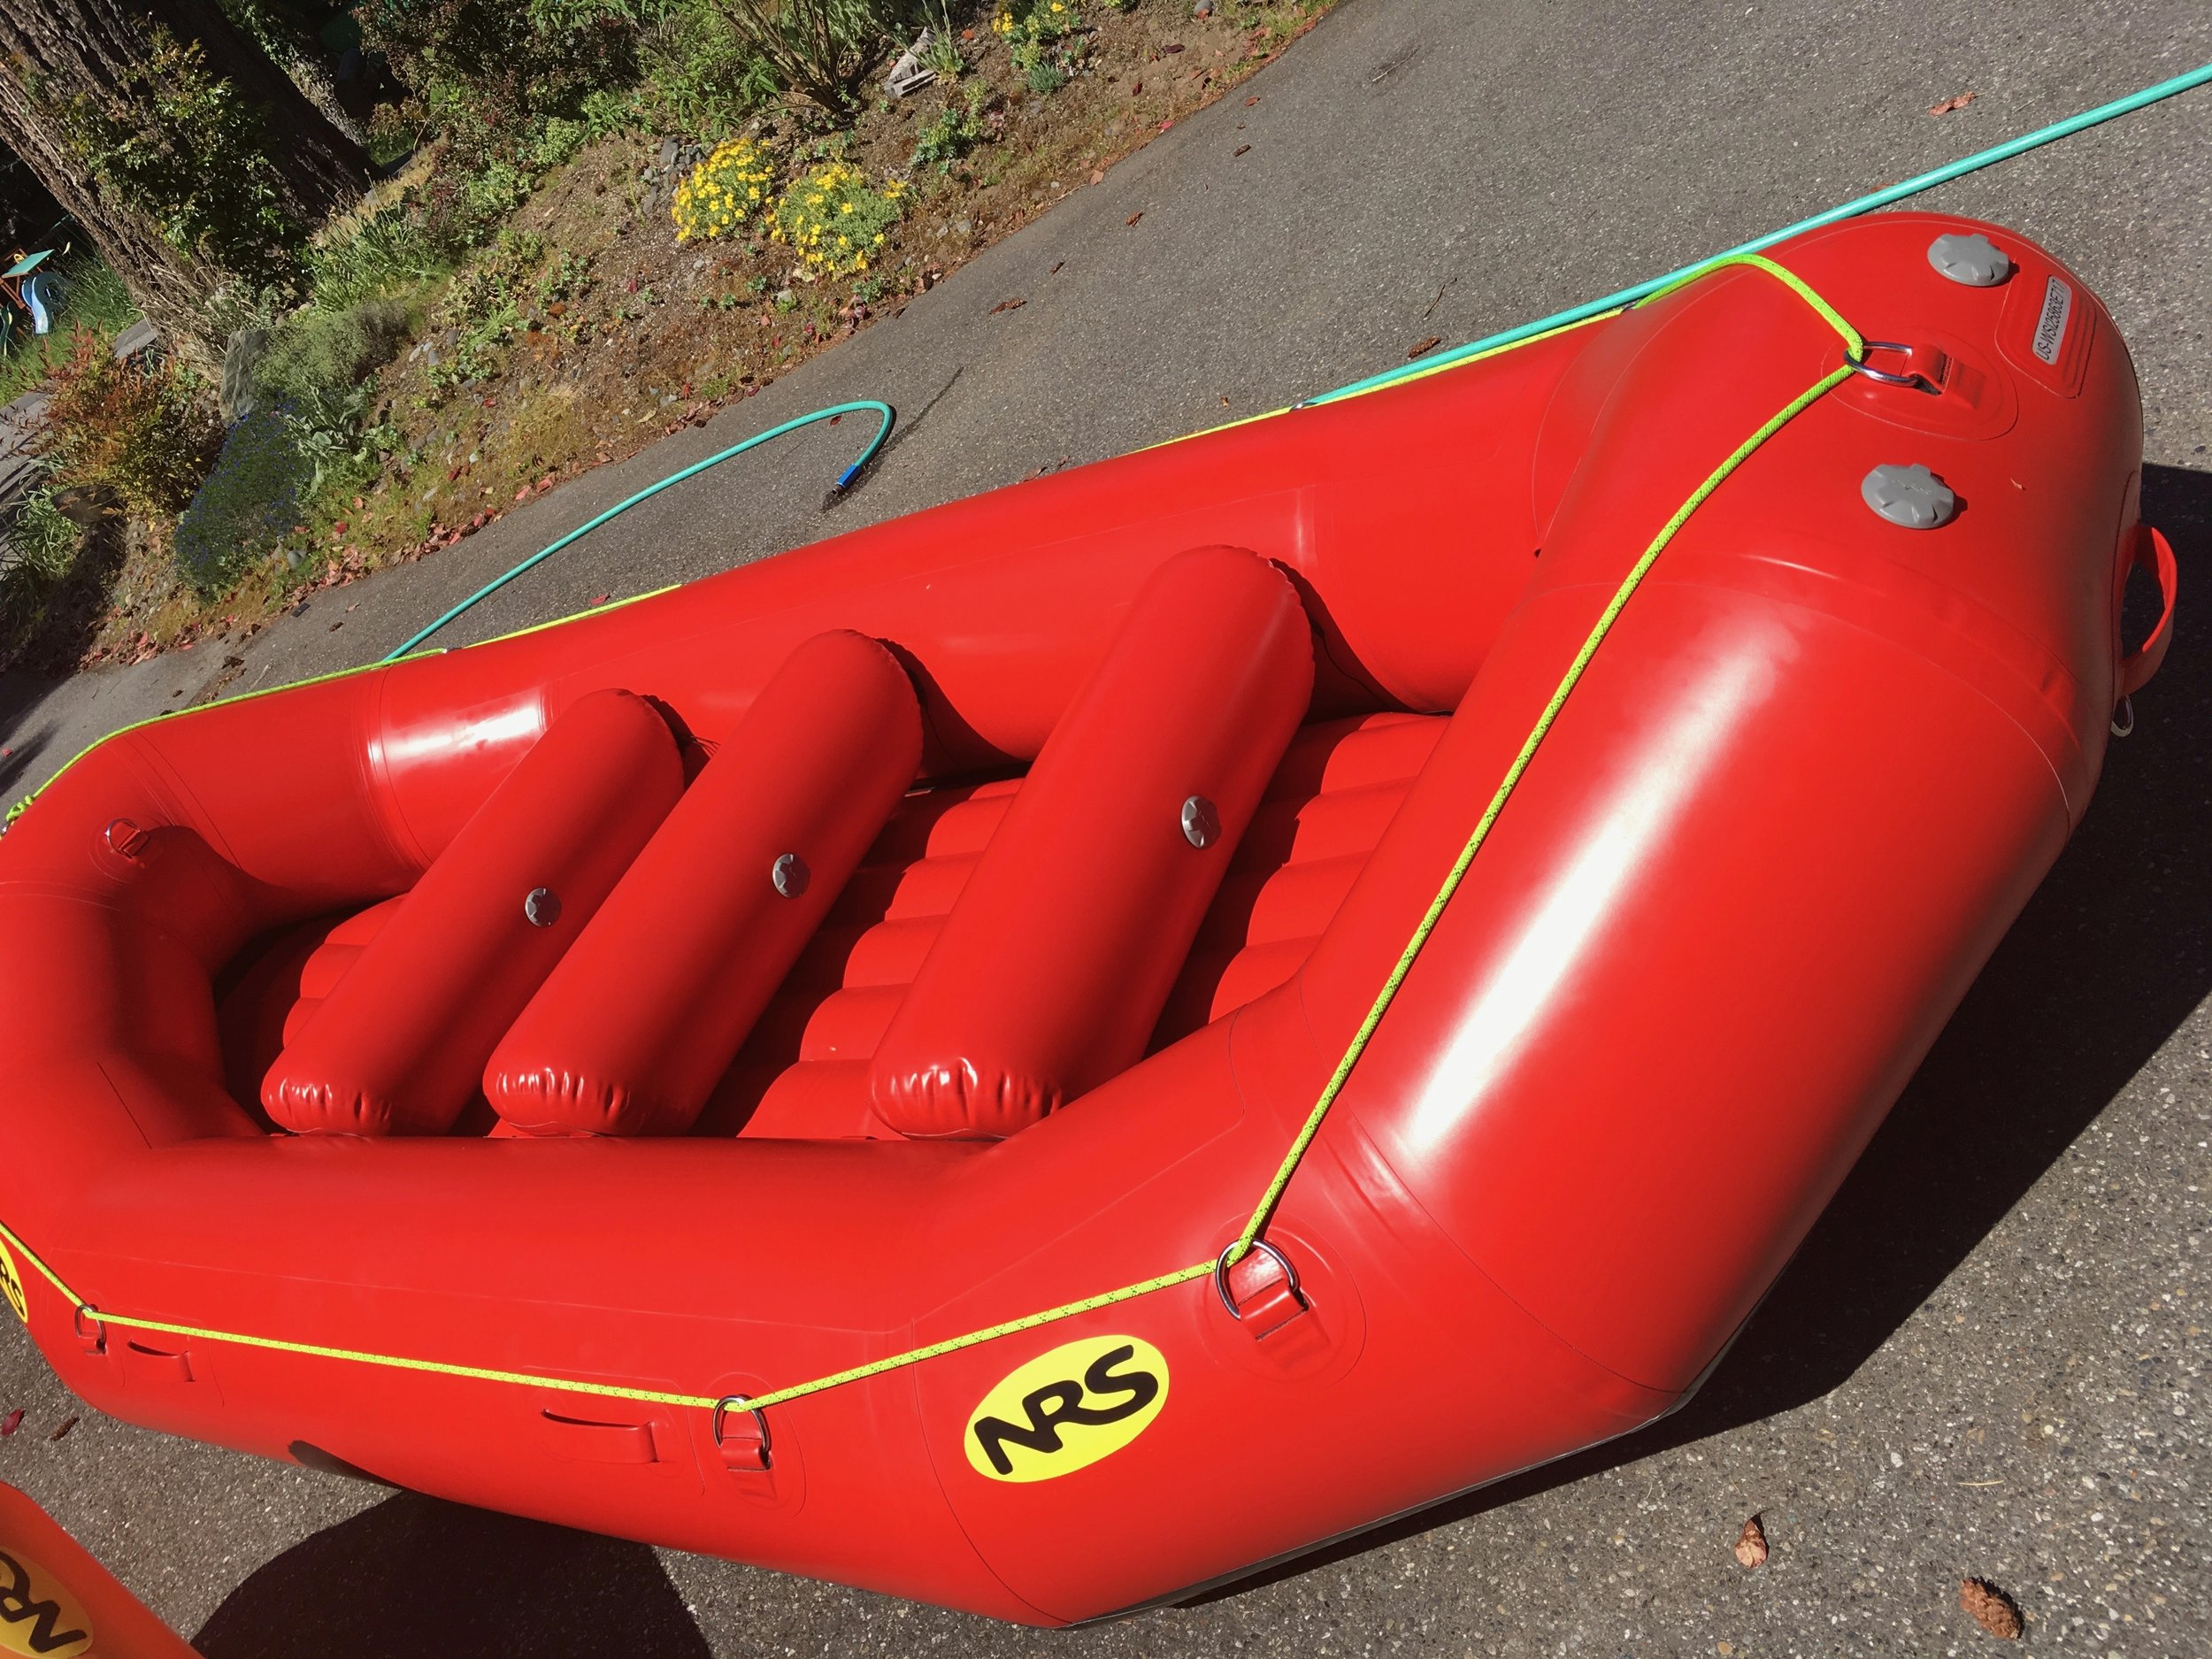 13 foot whitewater raft comparison shootout — Seattle White